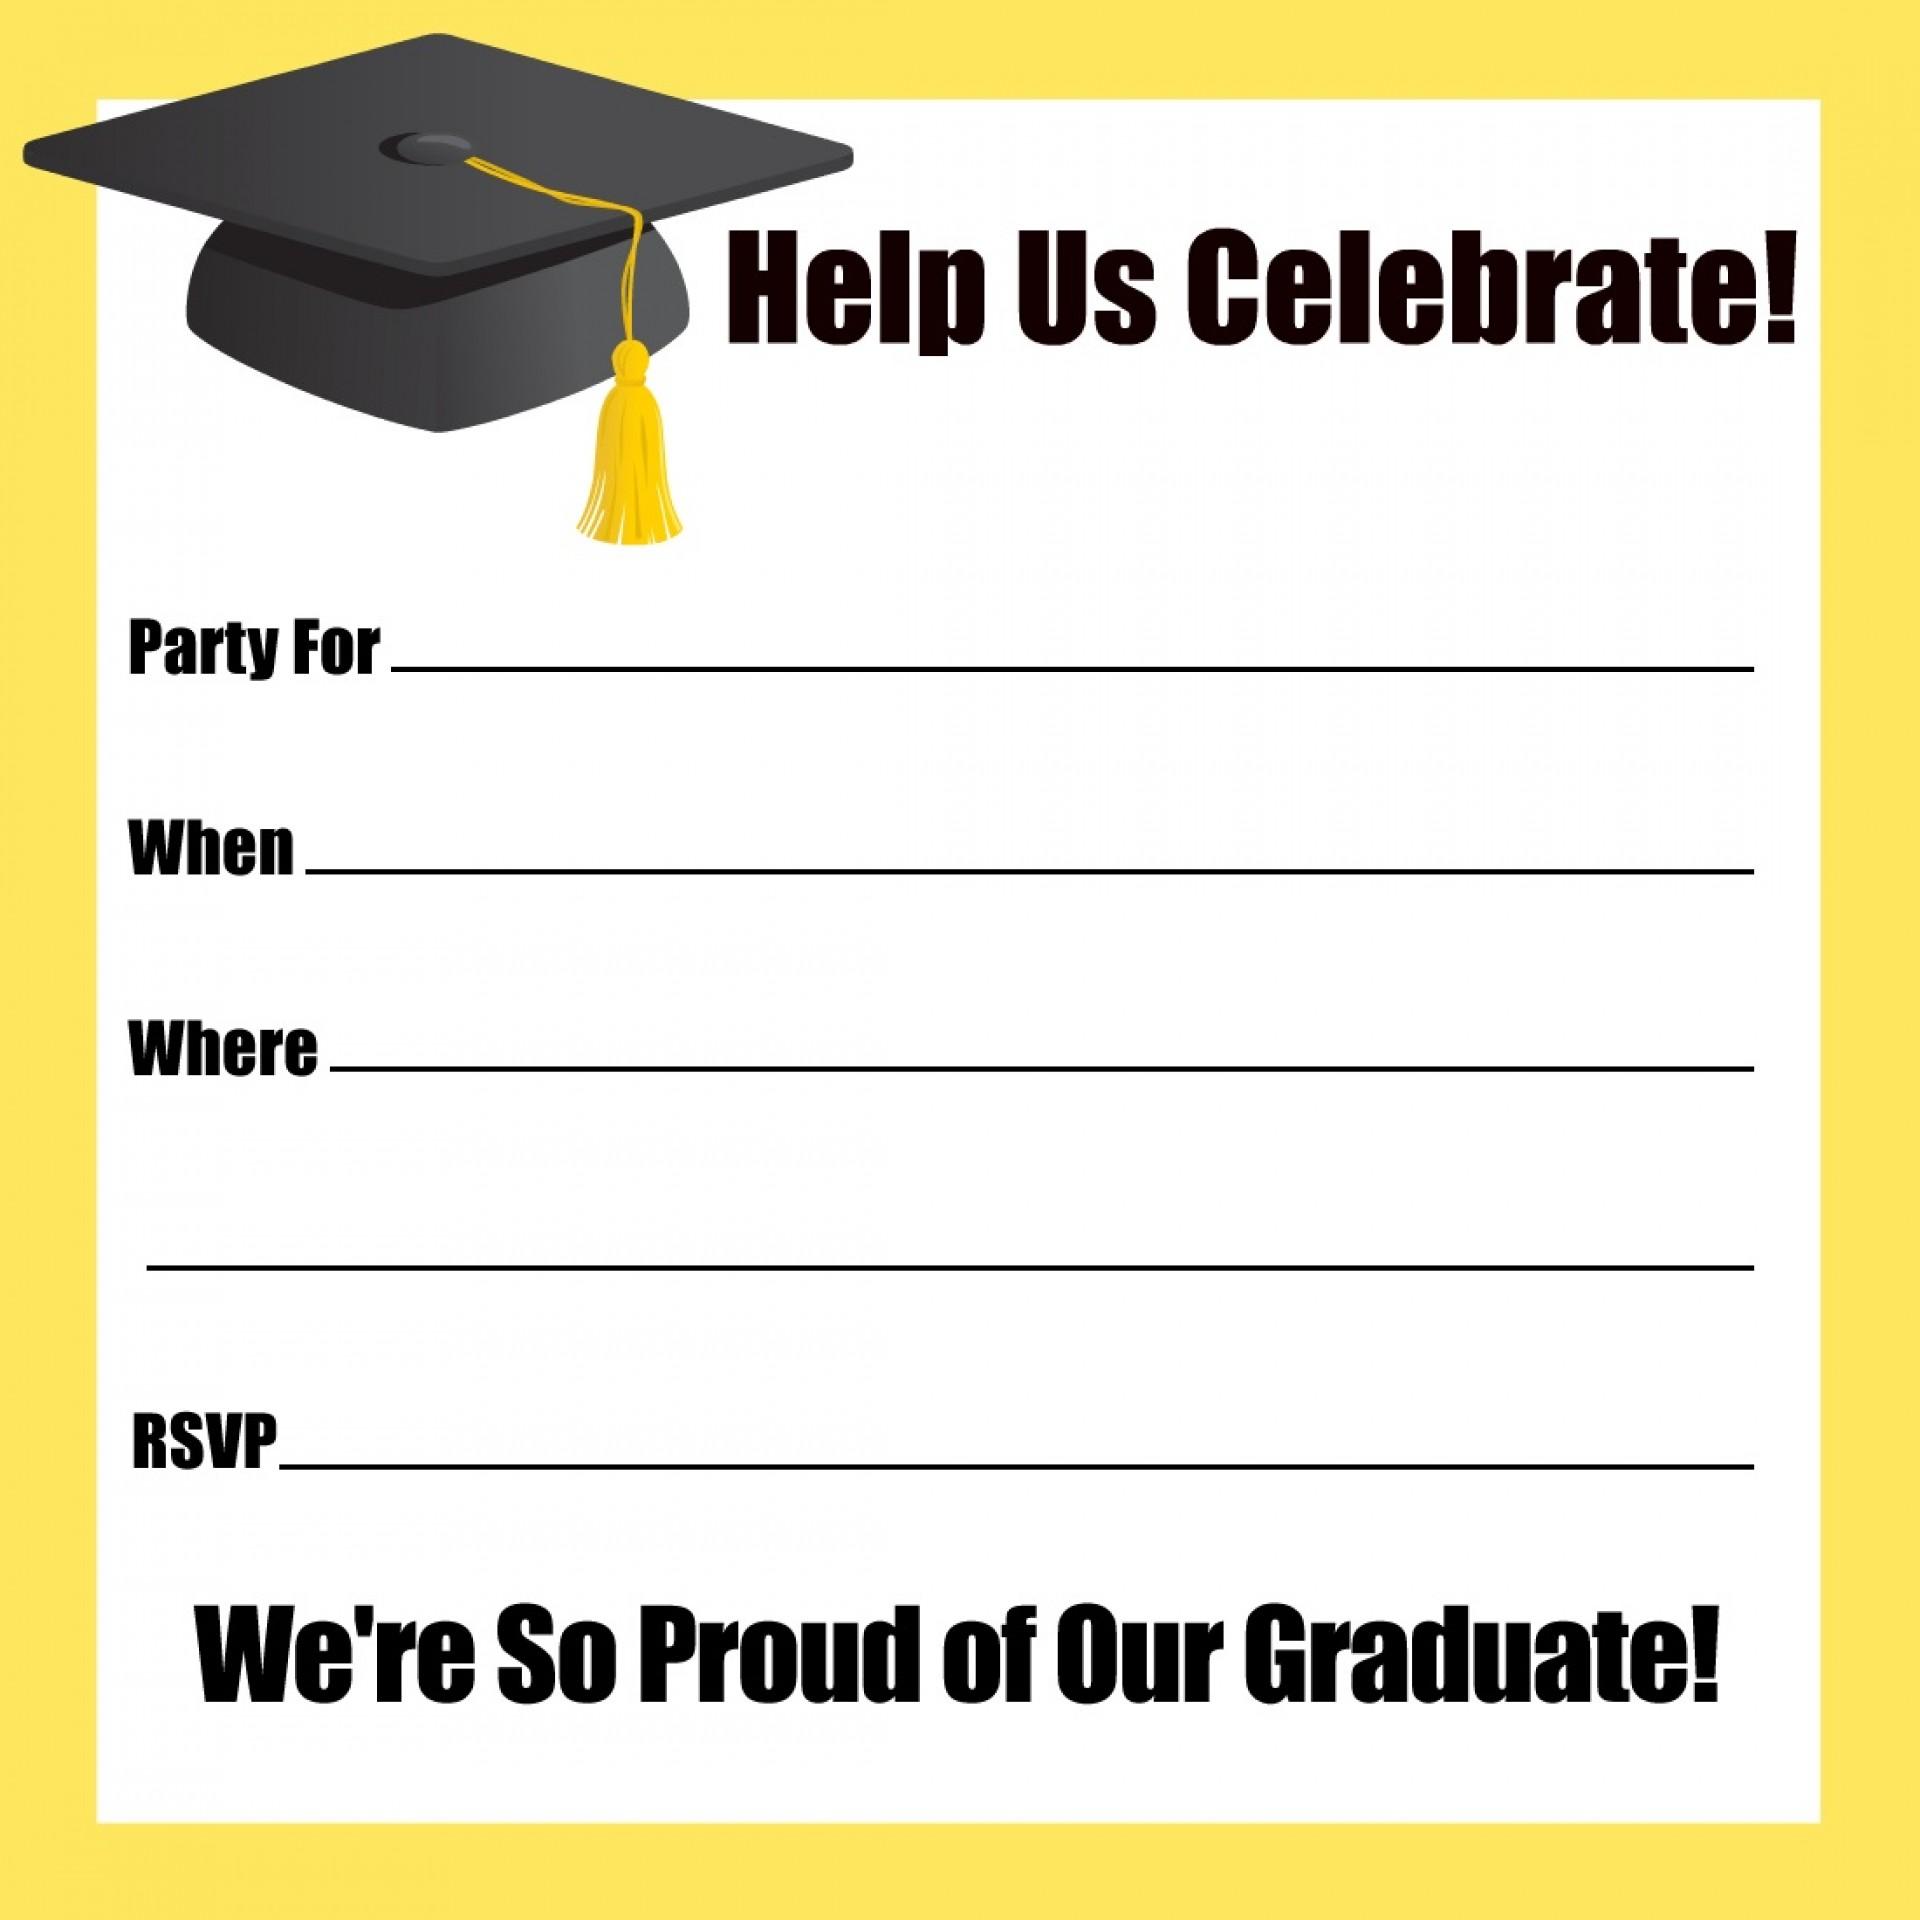 001 Striking Graduation Party Invitation Template Idea  Microsoft Word 4 Per Page1920